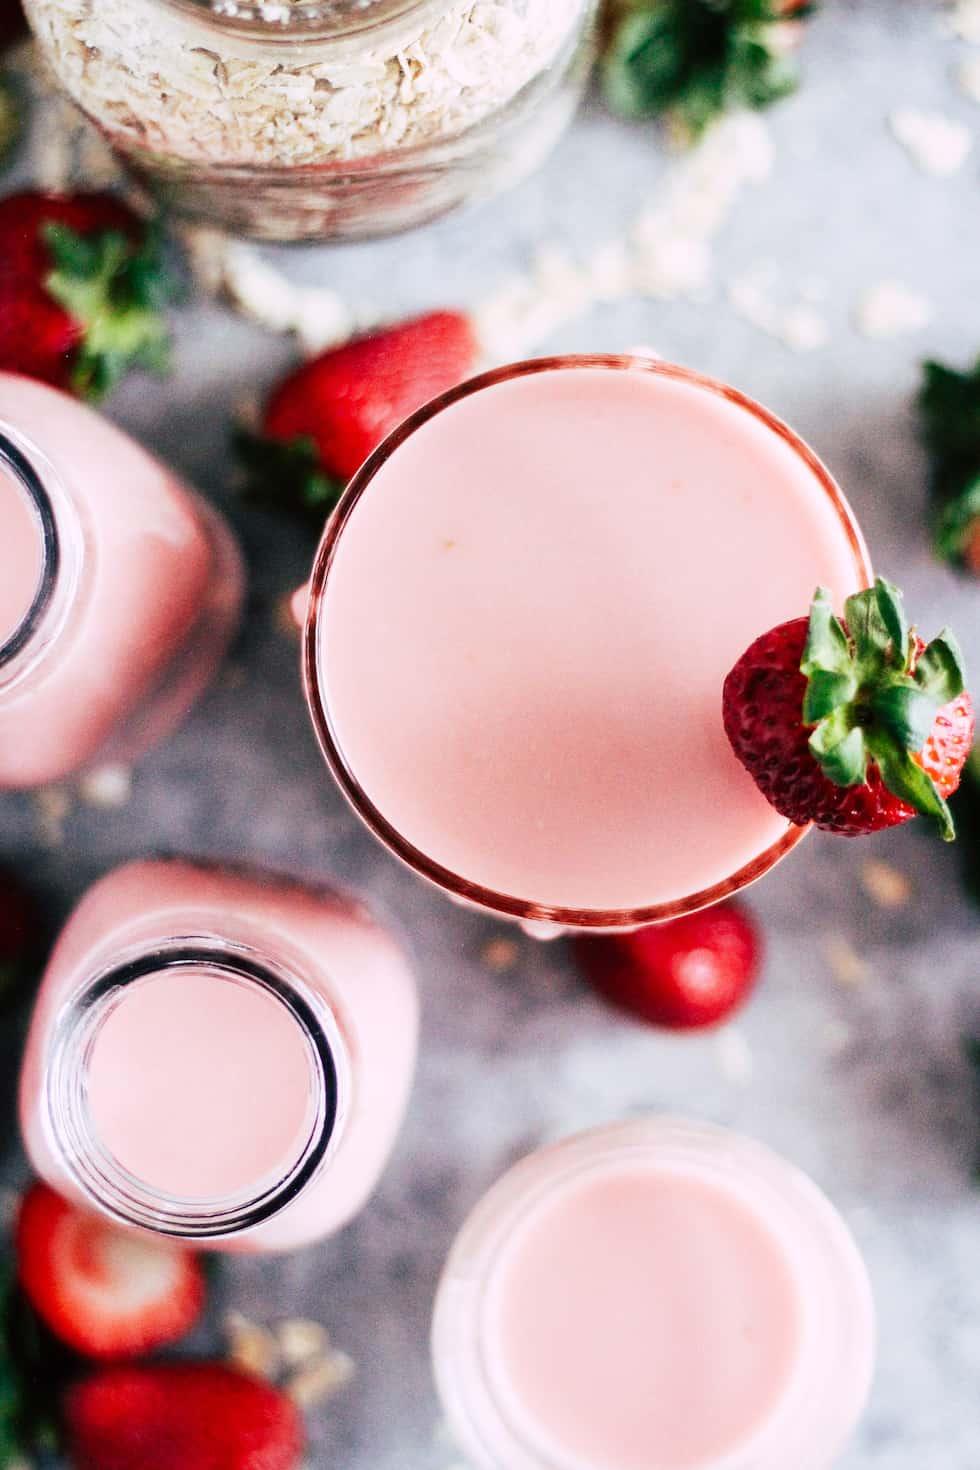 Overhead shot of strawberry oat milk against grey background.